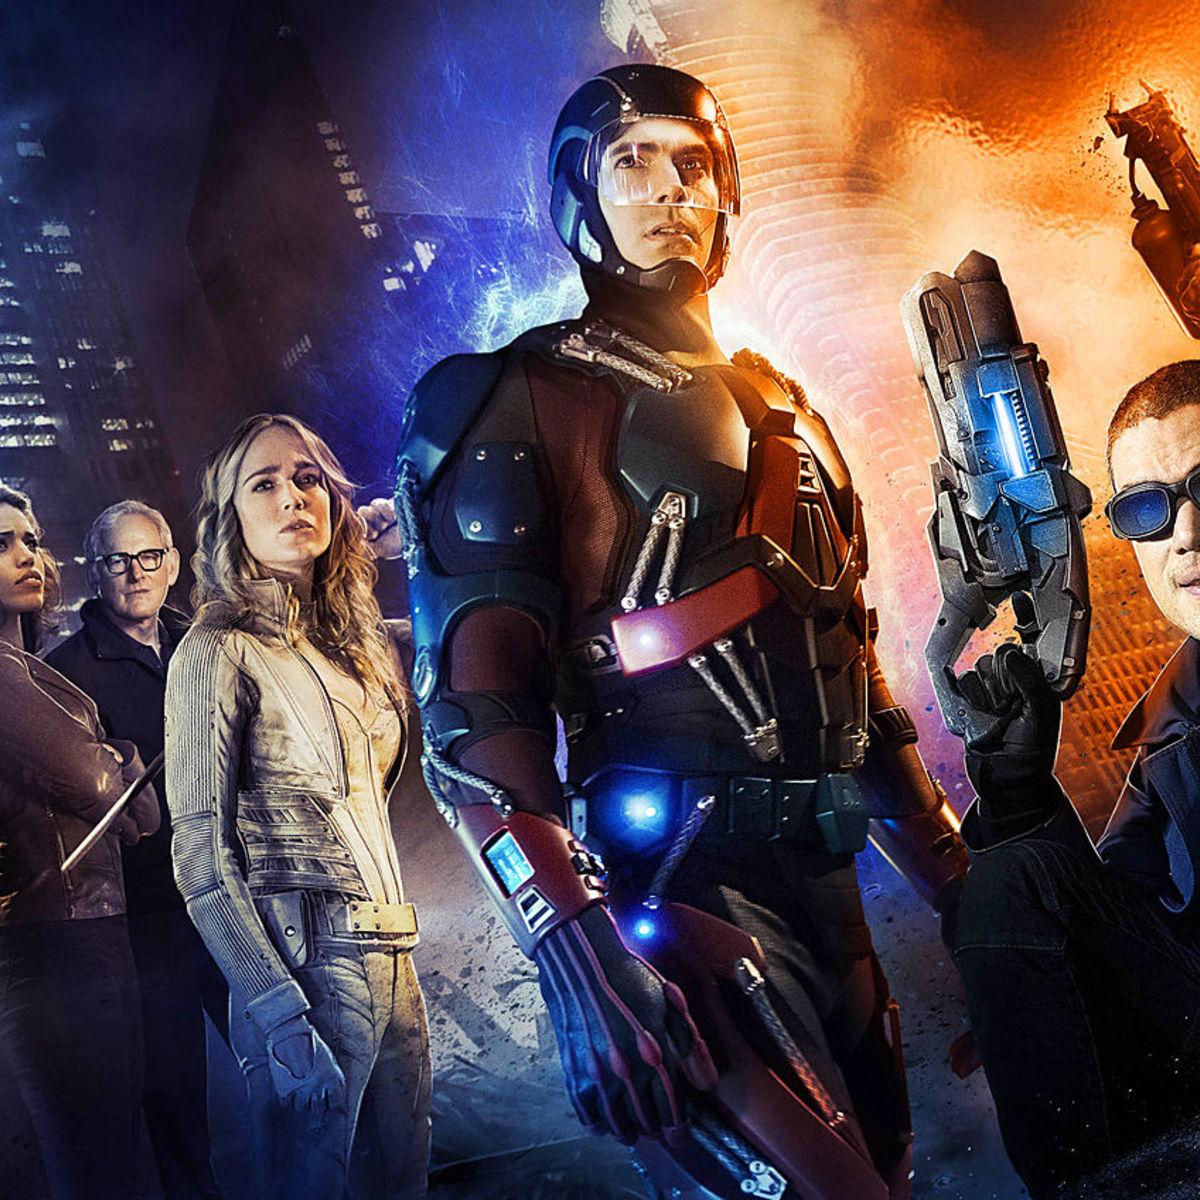 Legends-of-Tomorrow-Promo-Image-DC-CW-2016_0.jpg